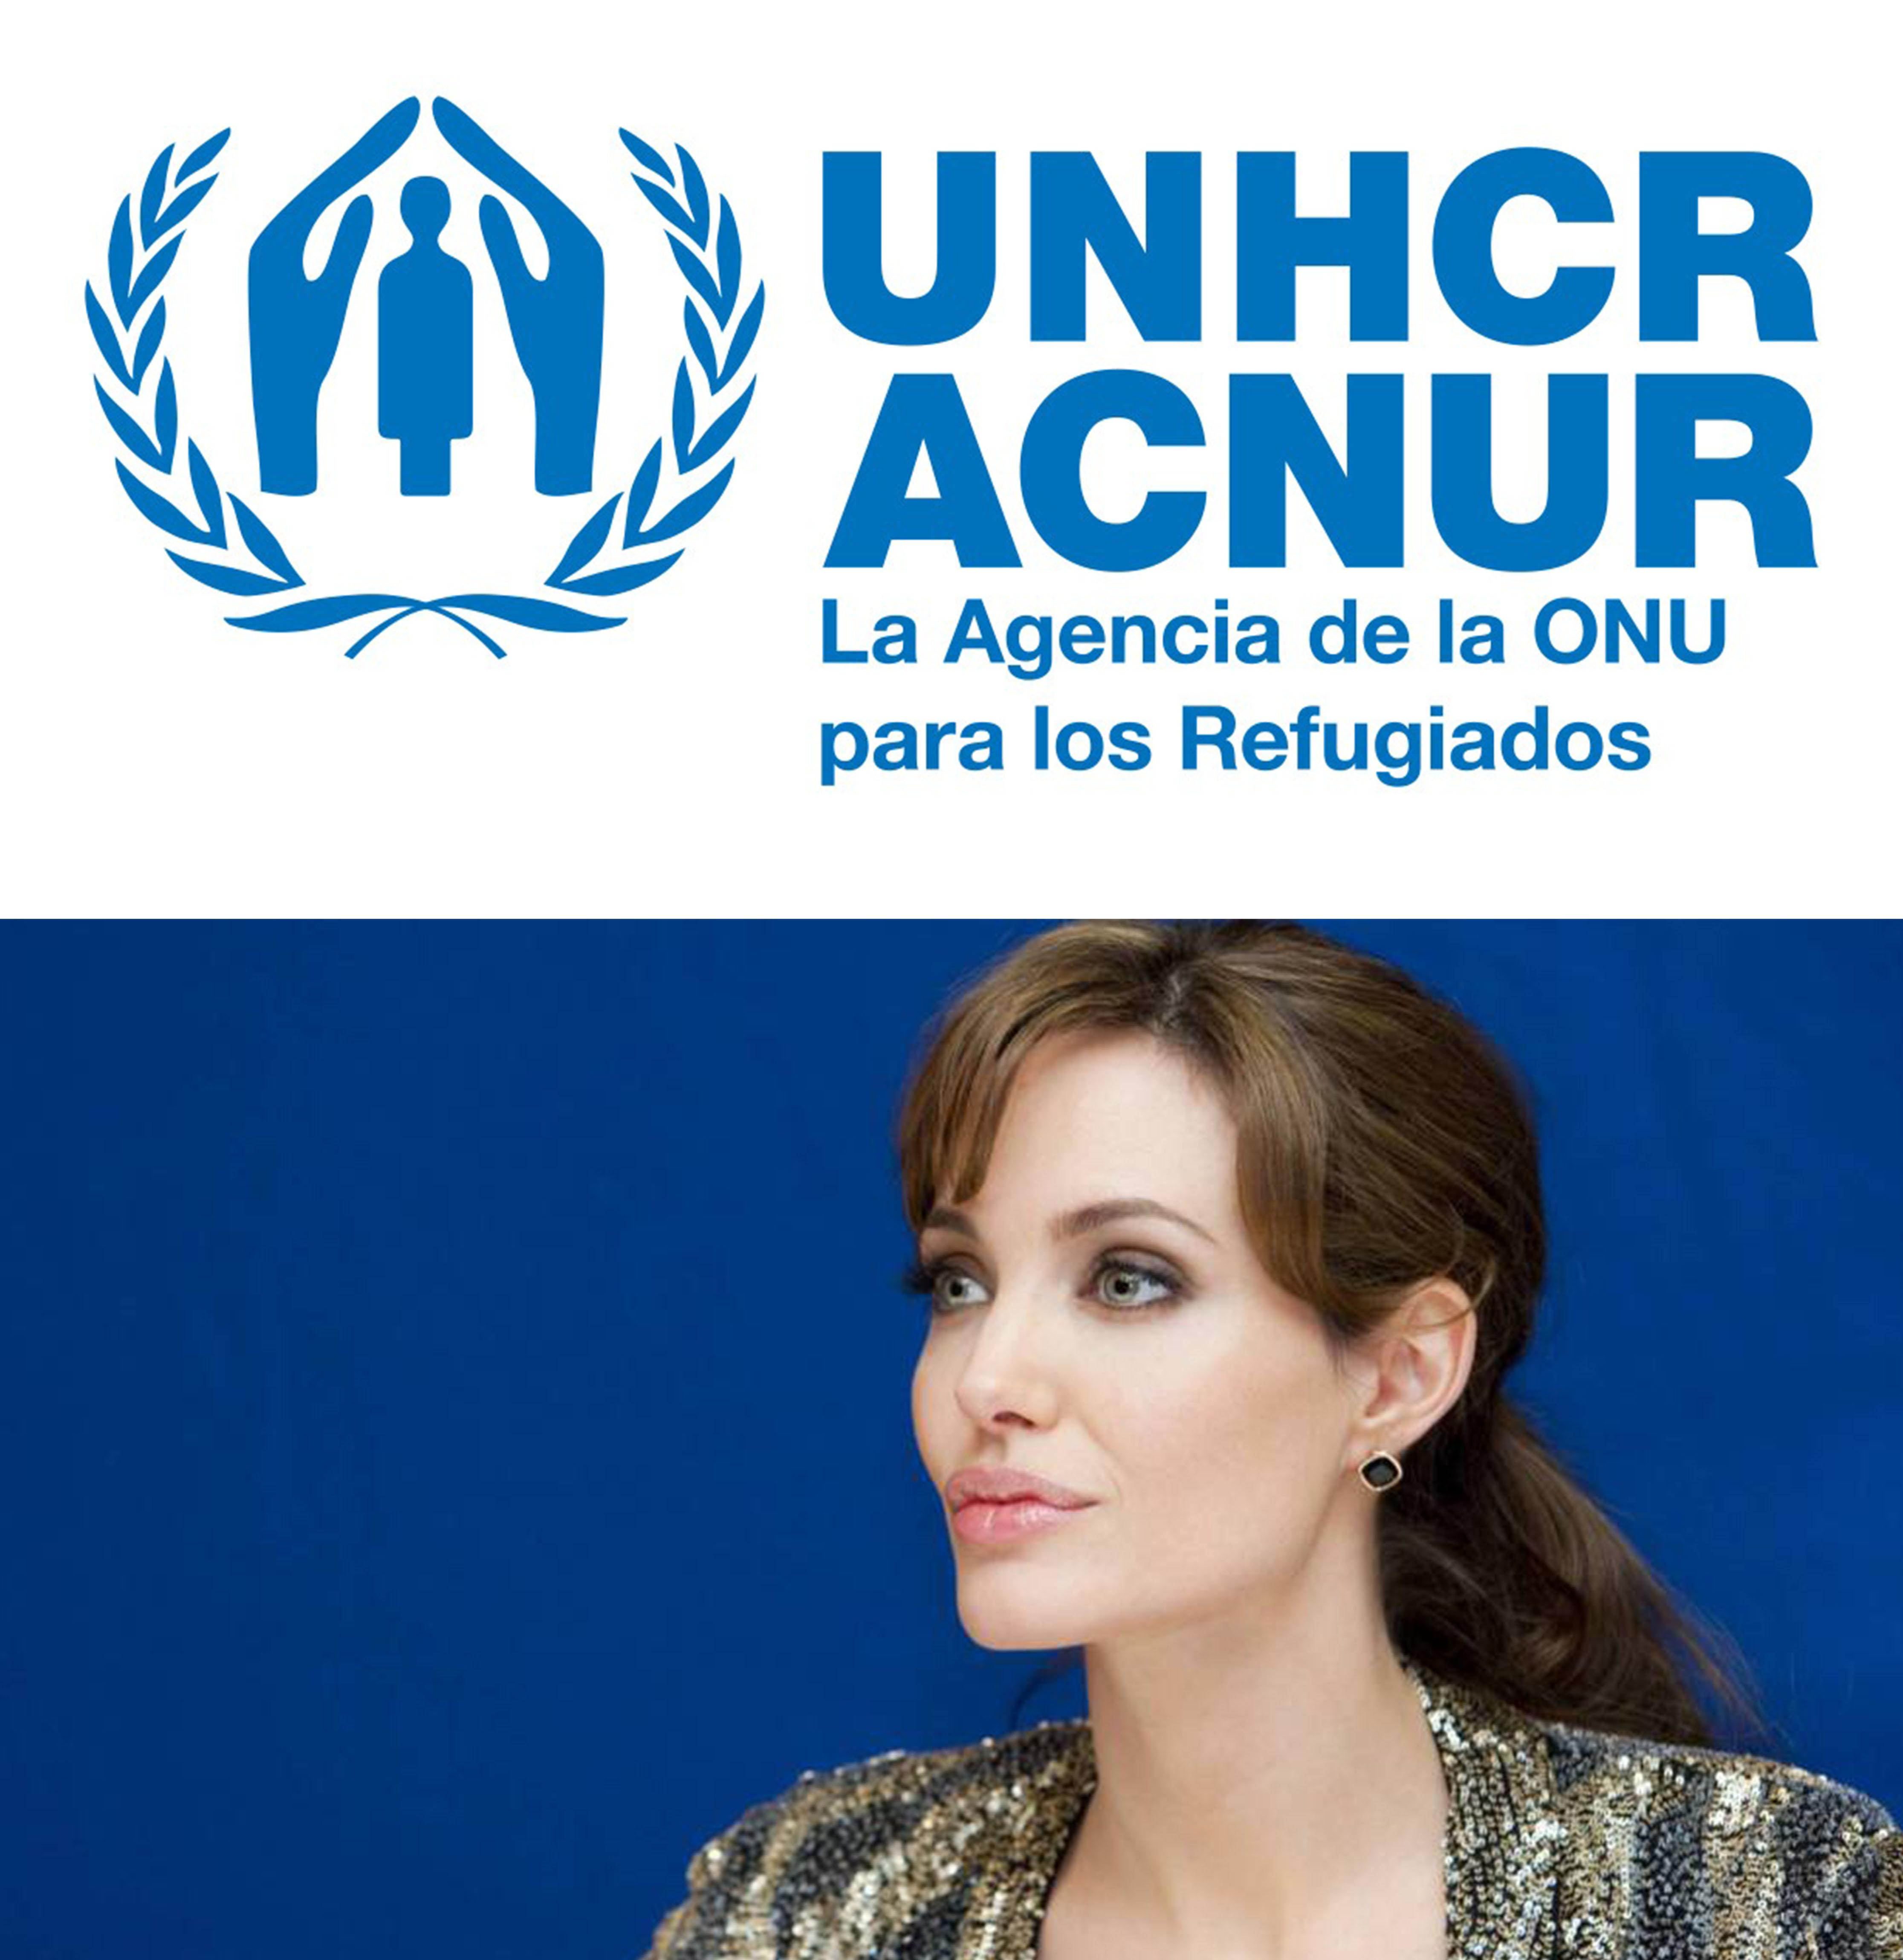 Angelina Jolie, enviada especial de ACNUR a frontera colombovenezolana